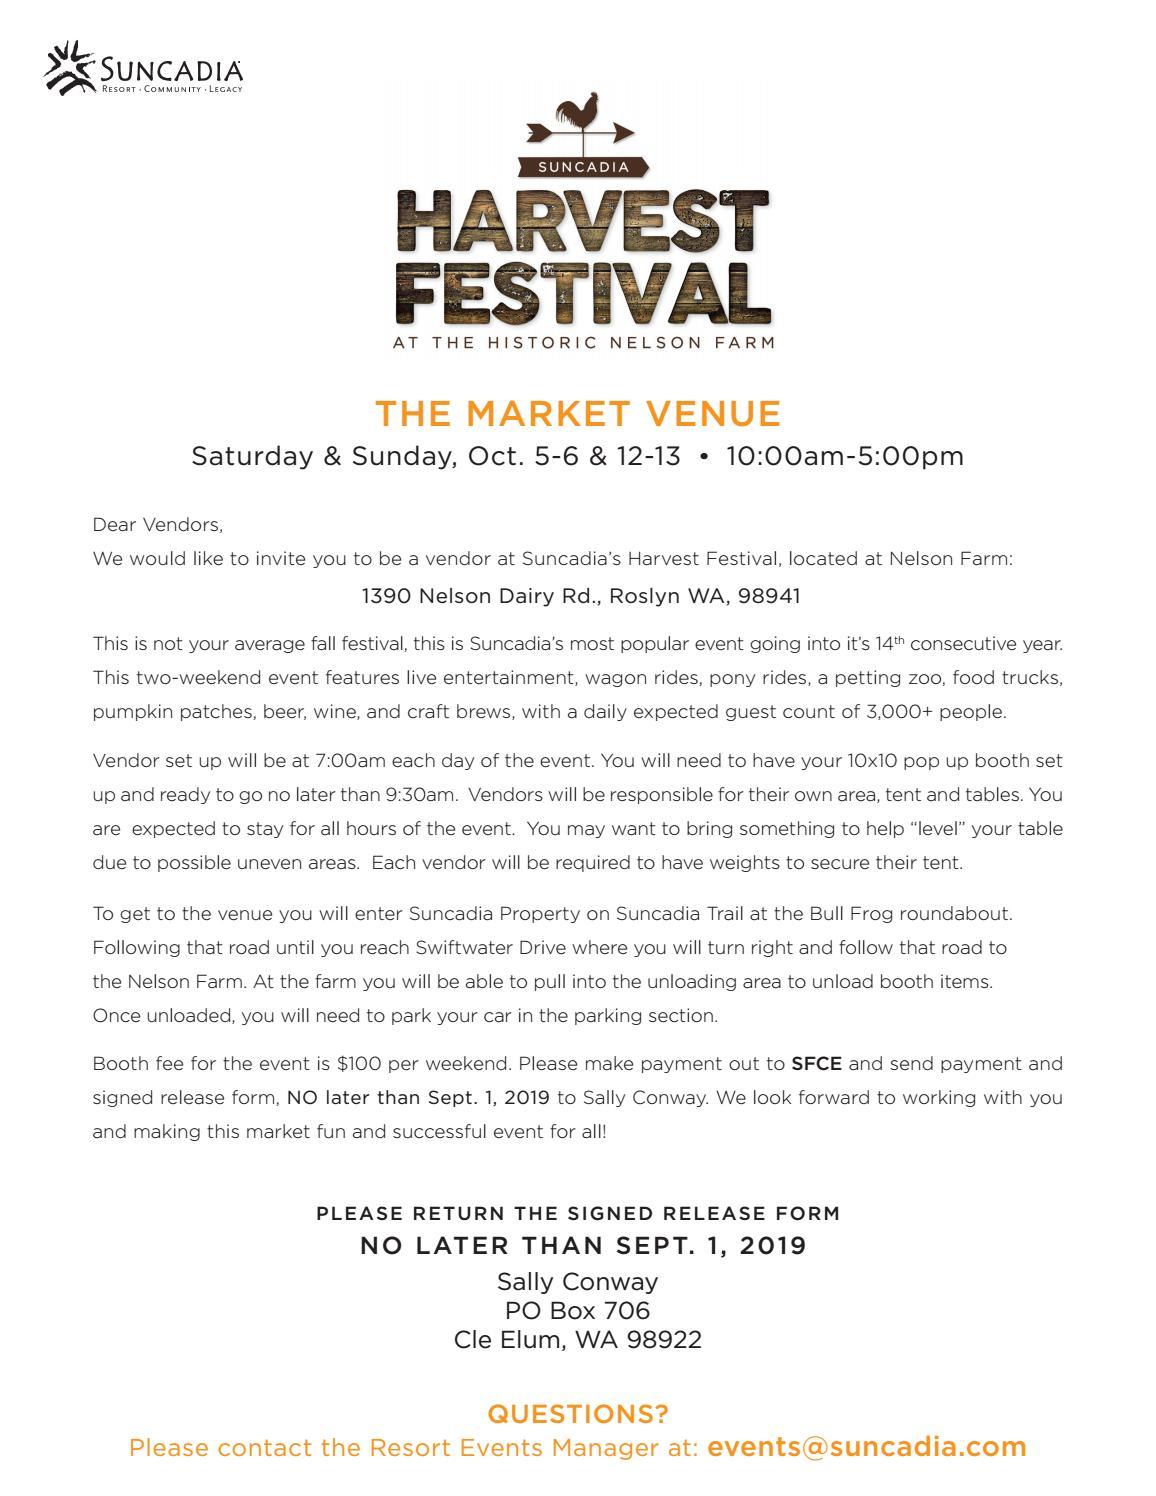 Suncadia Vendor Application, Harvest Festival by Suncadia Resort - issuu